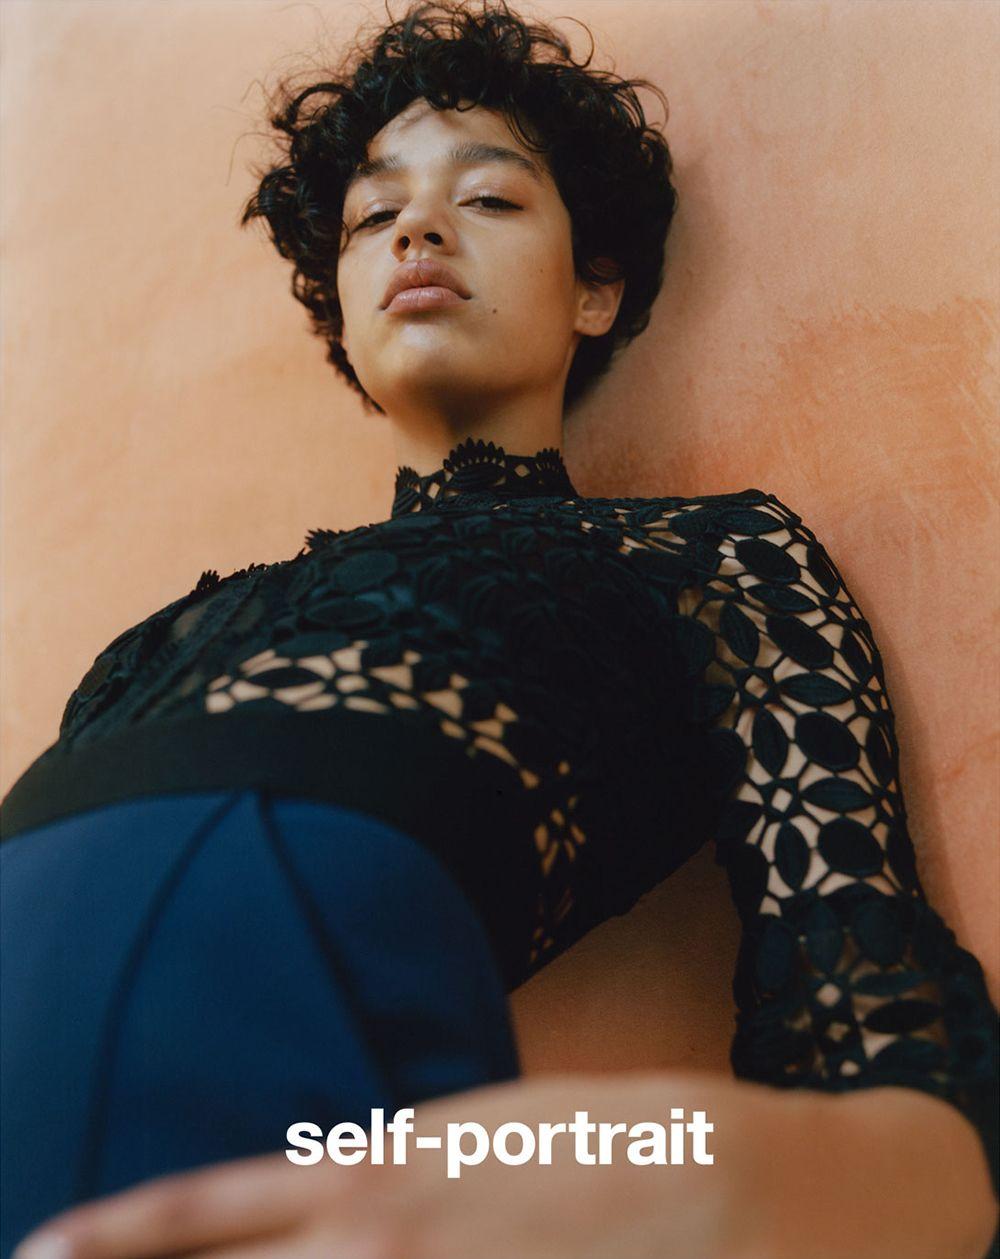 Fashion Copious - Damaris Goddrie for Self Portrait FW 15.16 Campaign by Lea Colombo